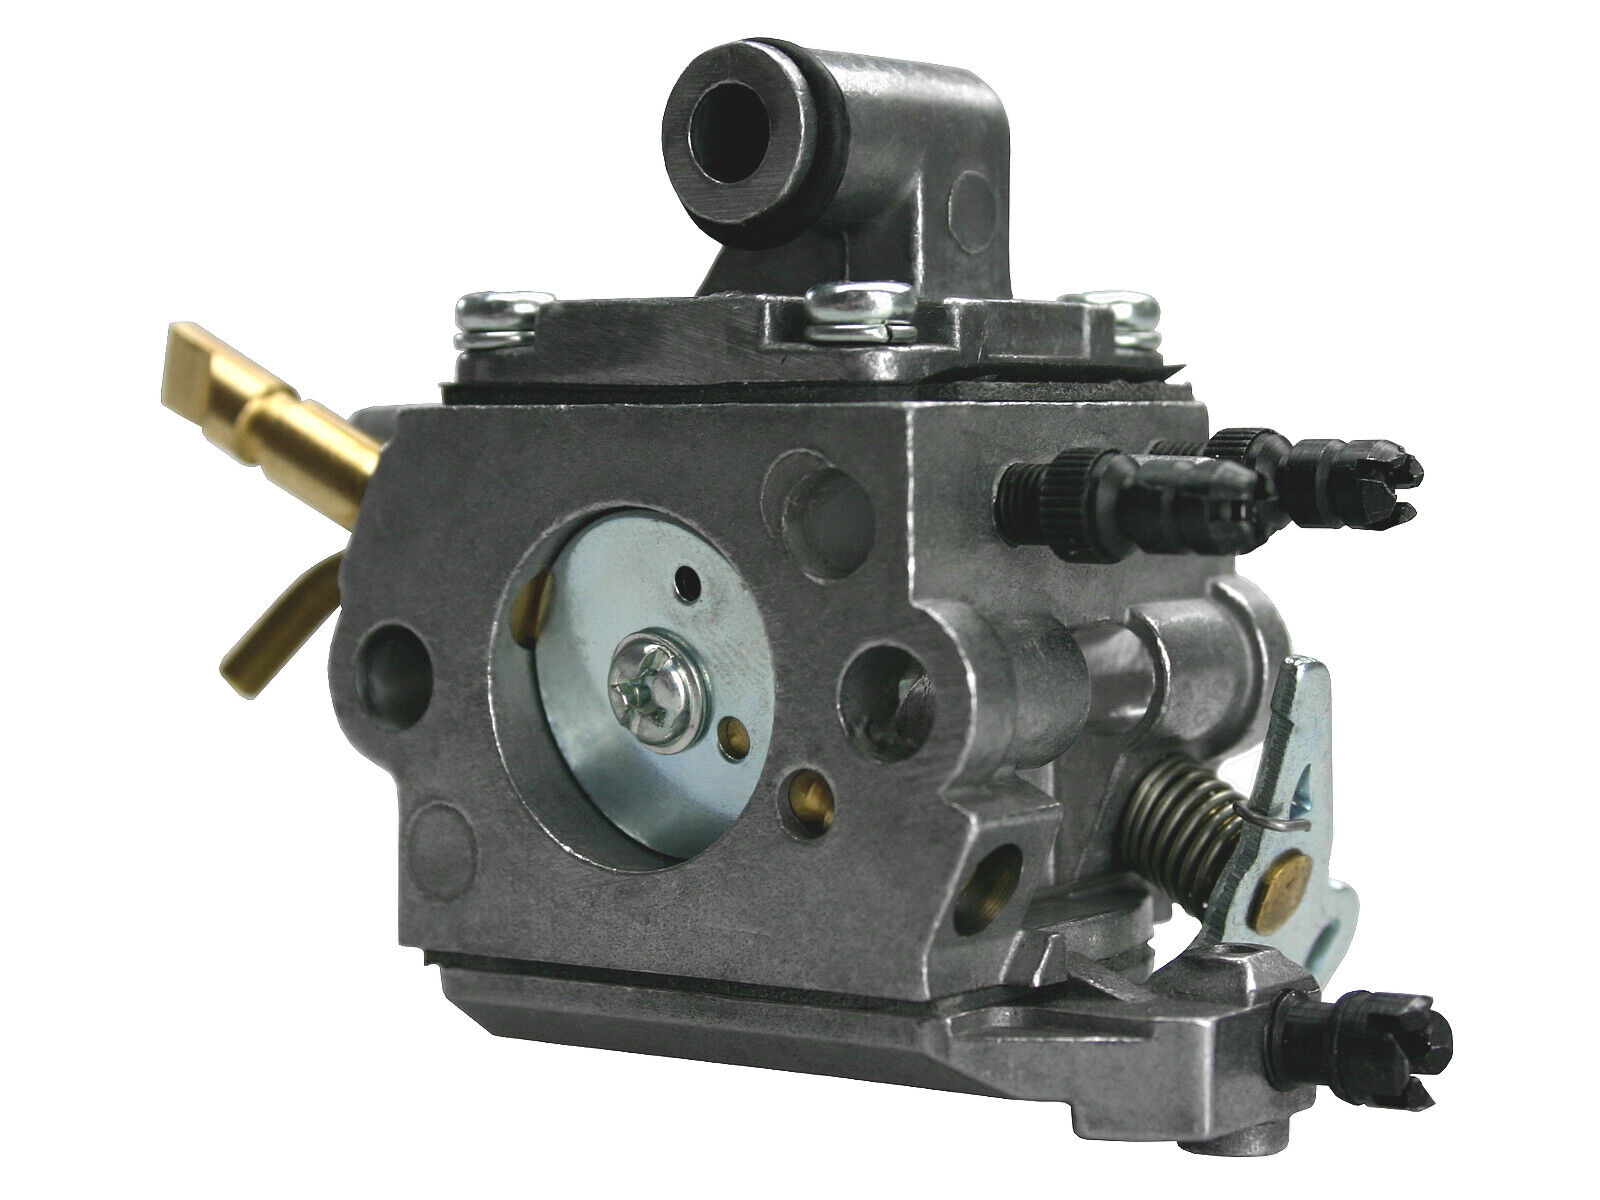 Dichtung Kit Gasket für Stihl MS192T MS 192T 192 T